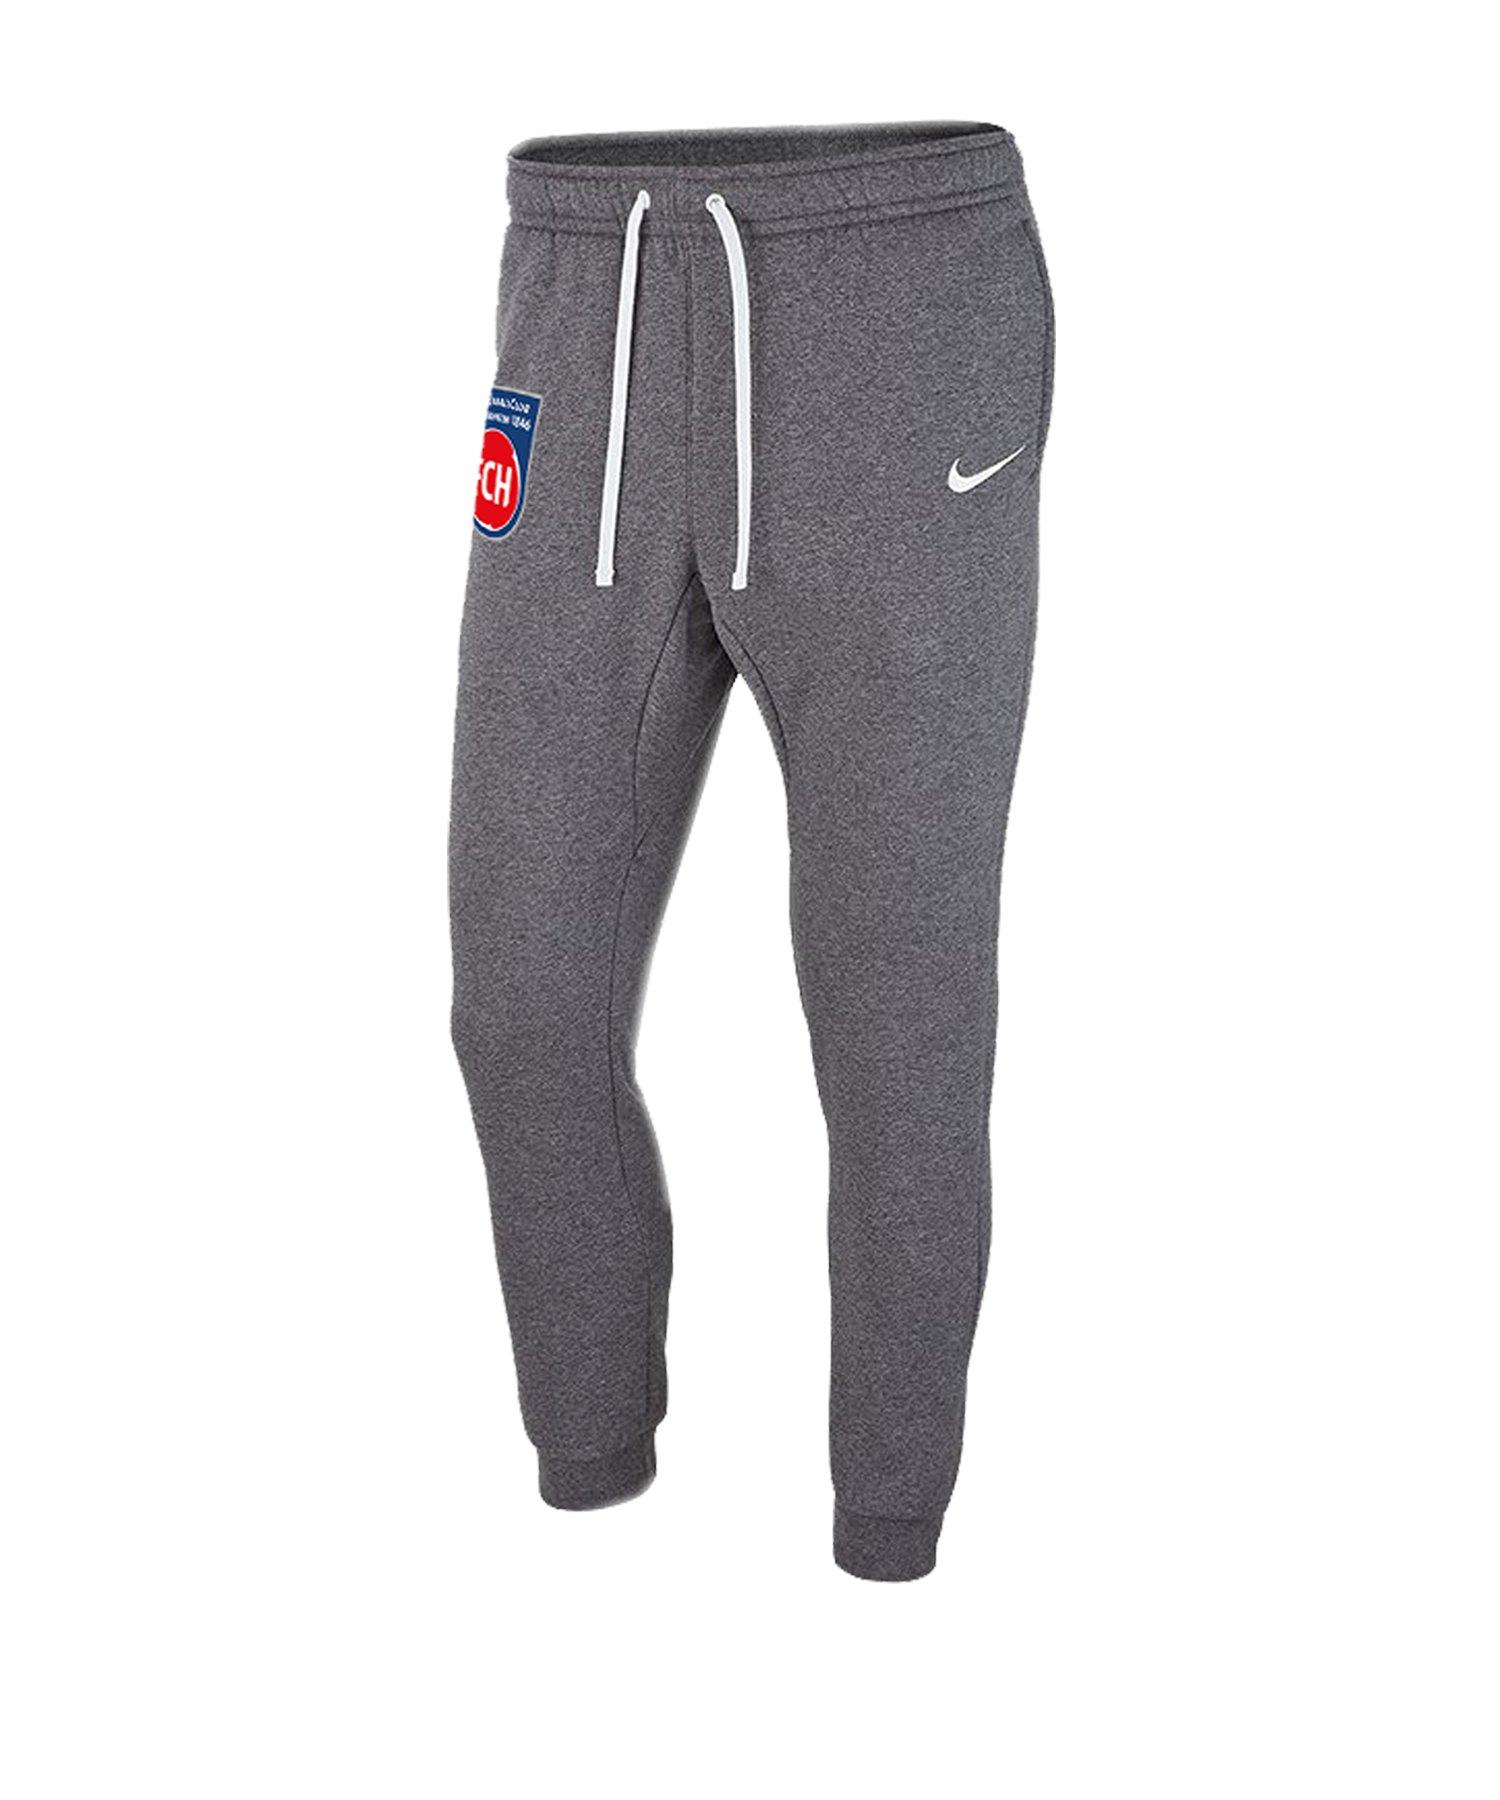 Nike 1. FC Heidenheim Jogginghose Grau F071 - grau